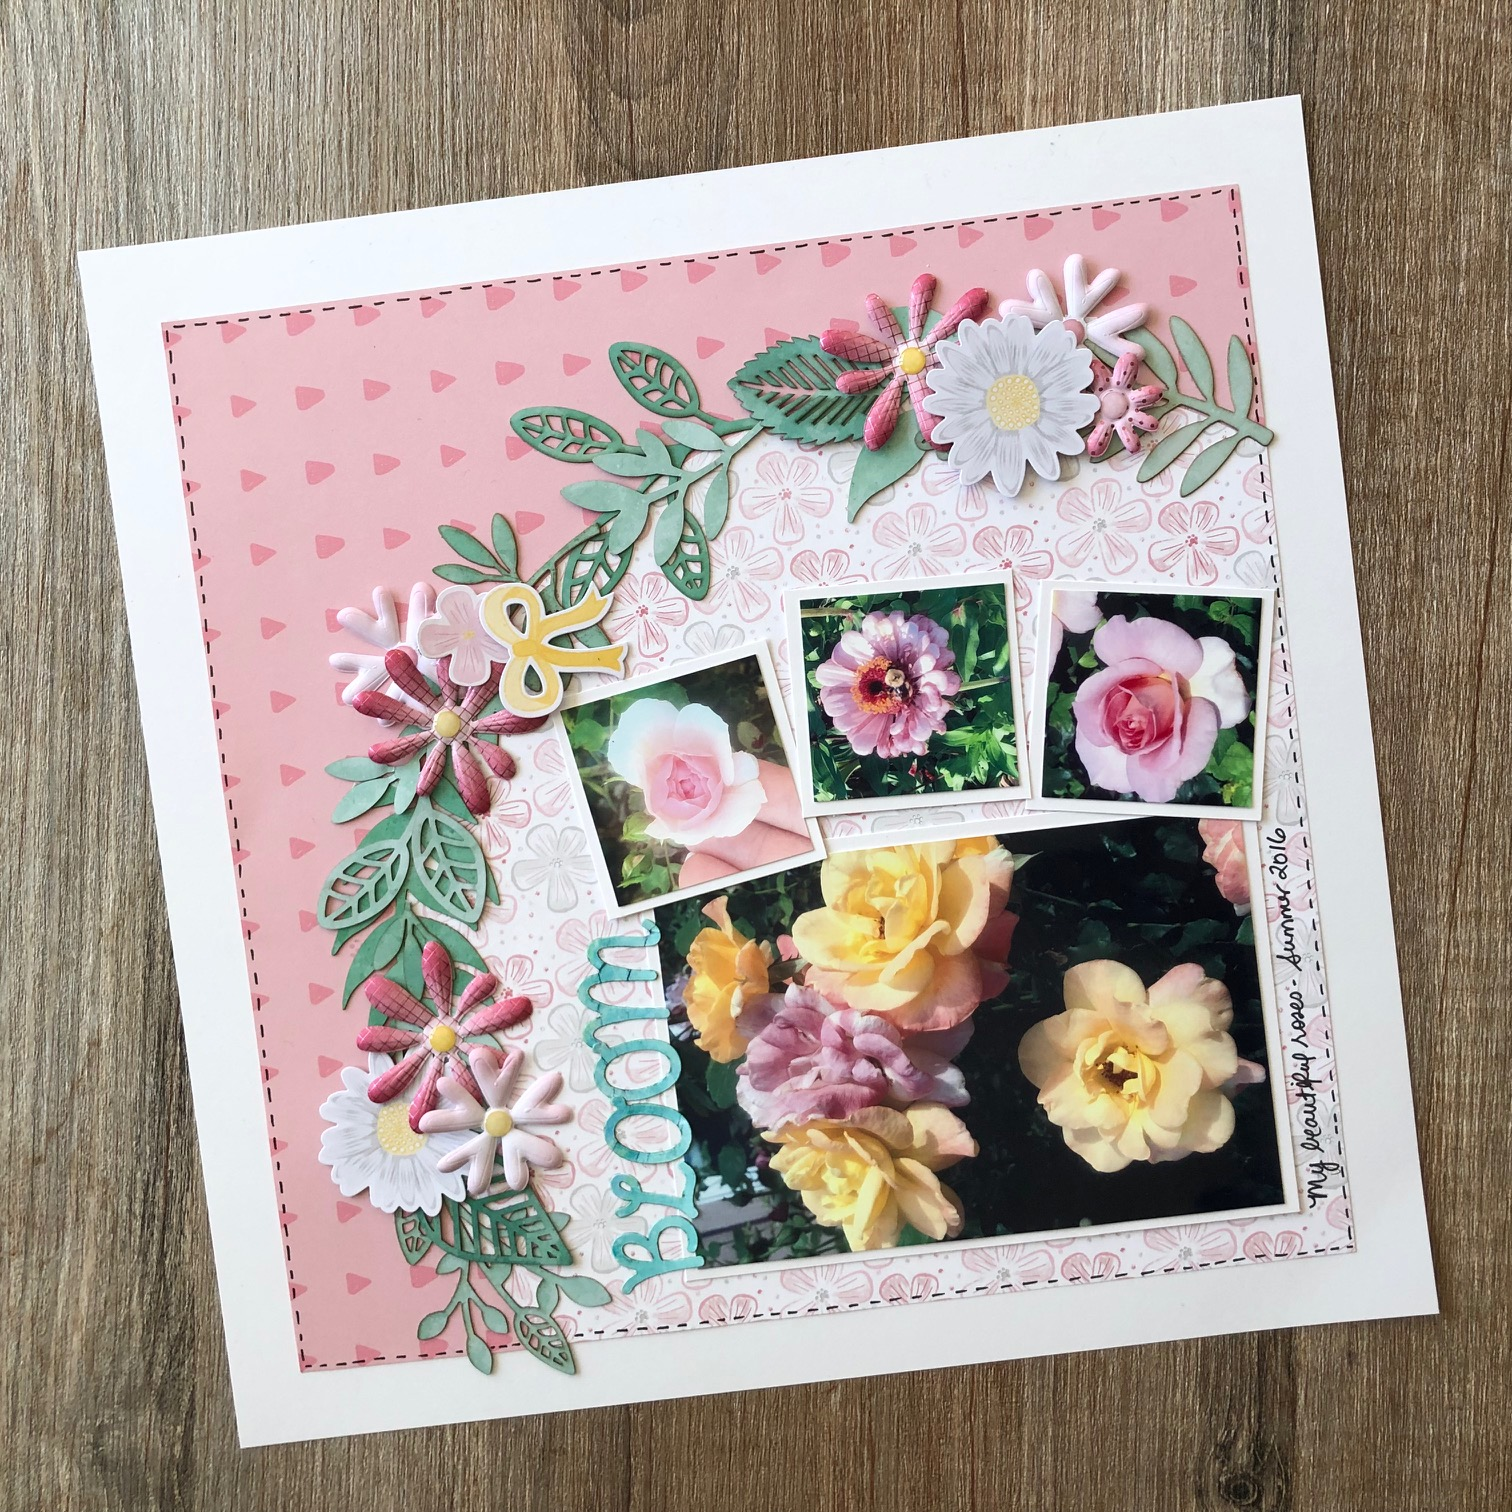 collage-template-wreath-noreen-smith-creative-memories1